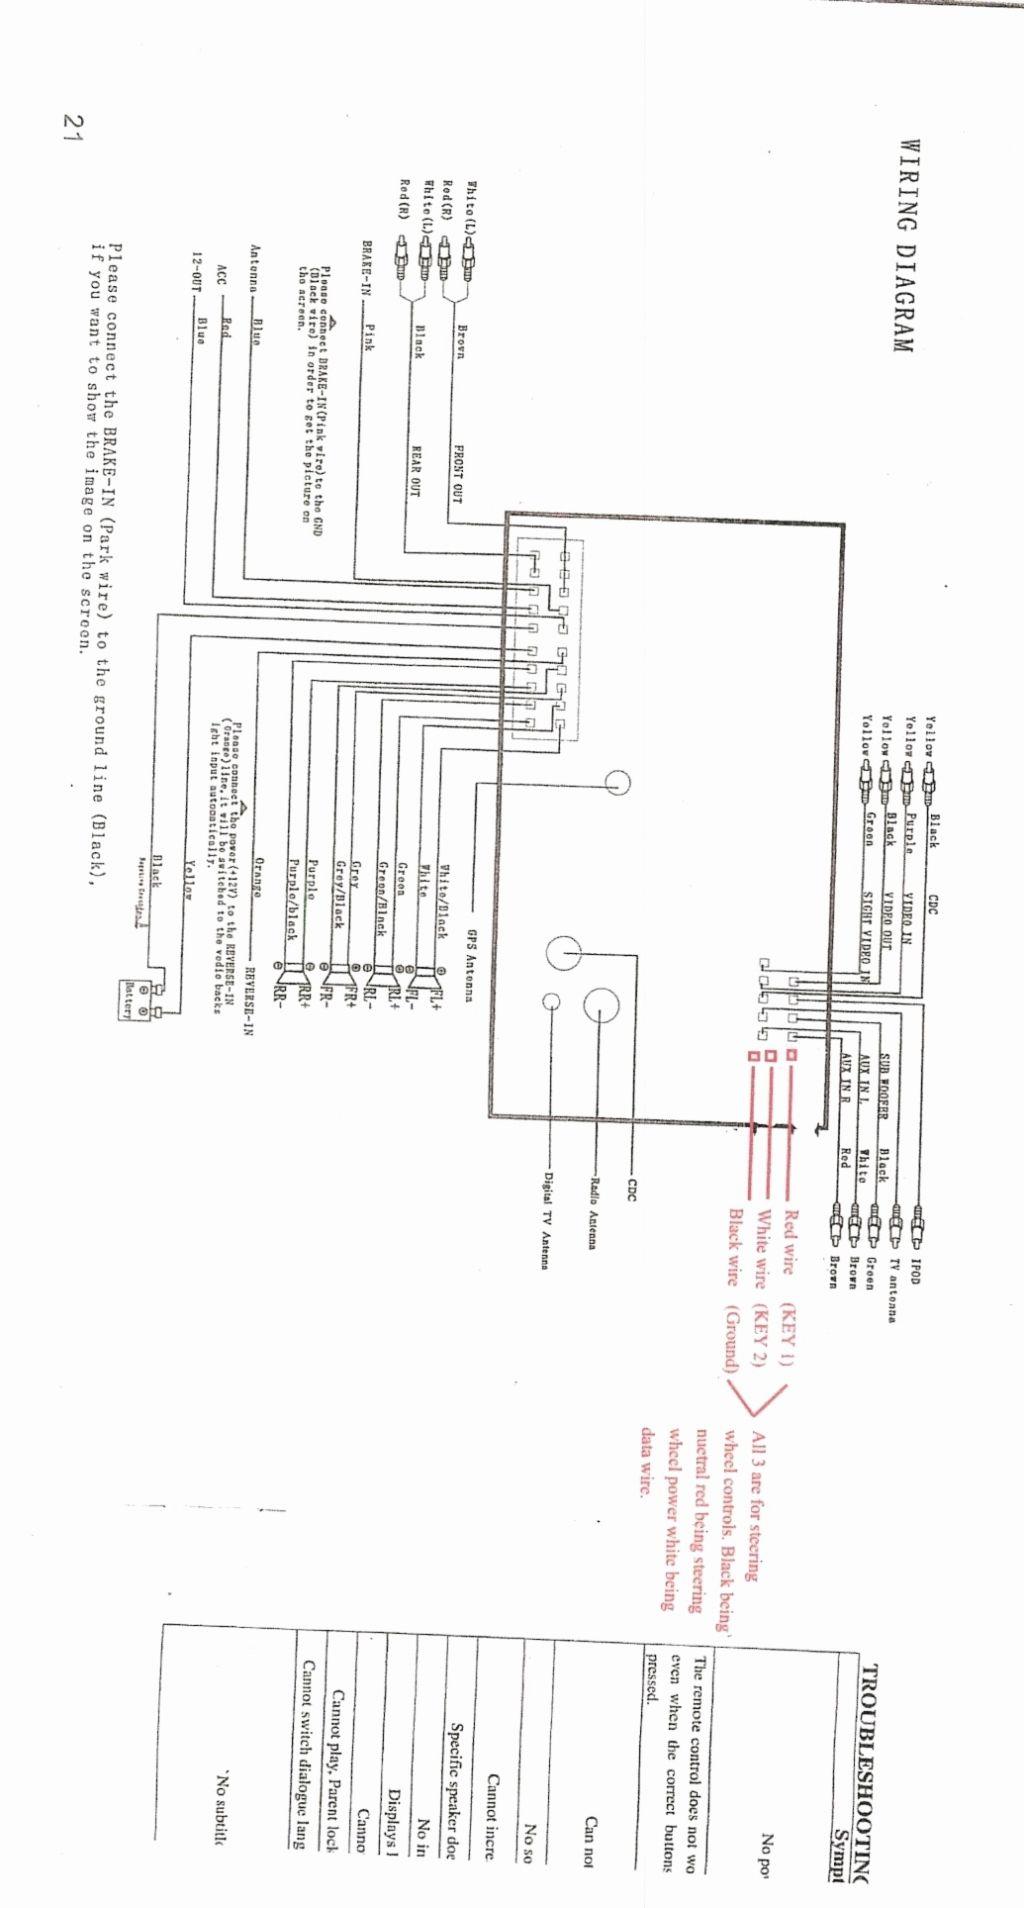 gmos lan 01 wiring diagram smart wiring diagrams u2022 rh krakencraft co GMOS- 04 Installation Axxess GMOS-01 Installation